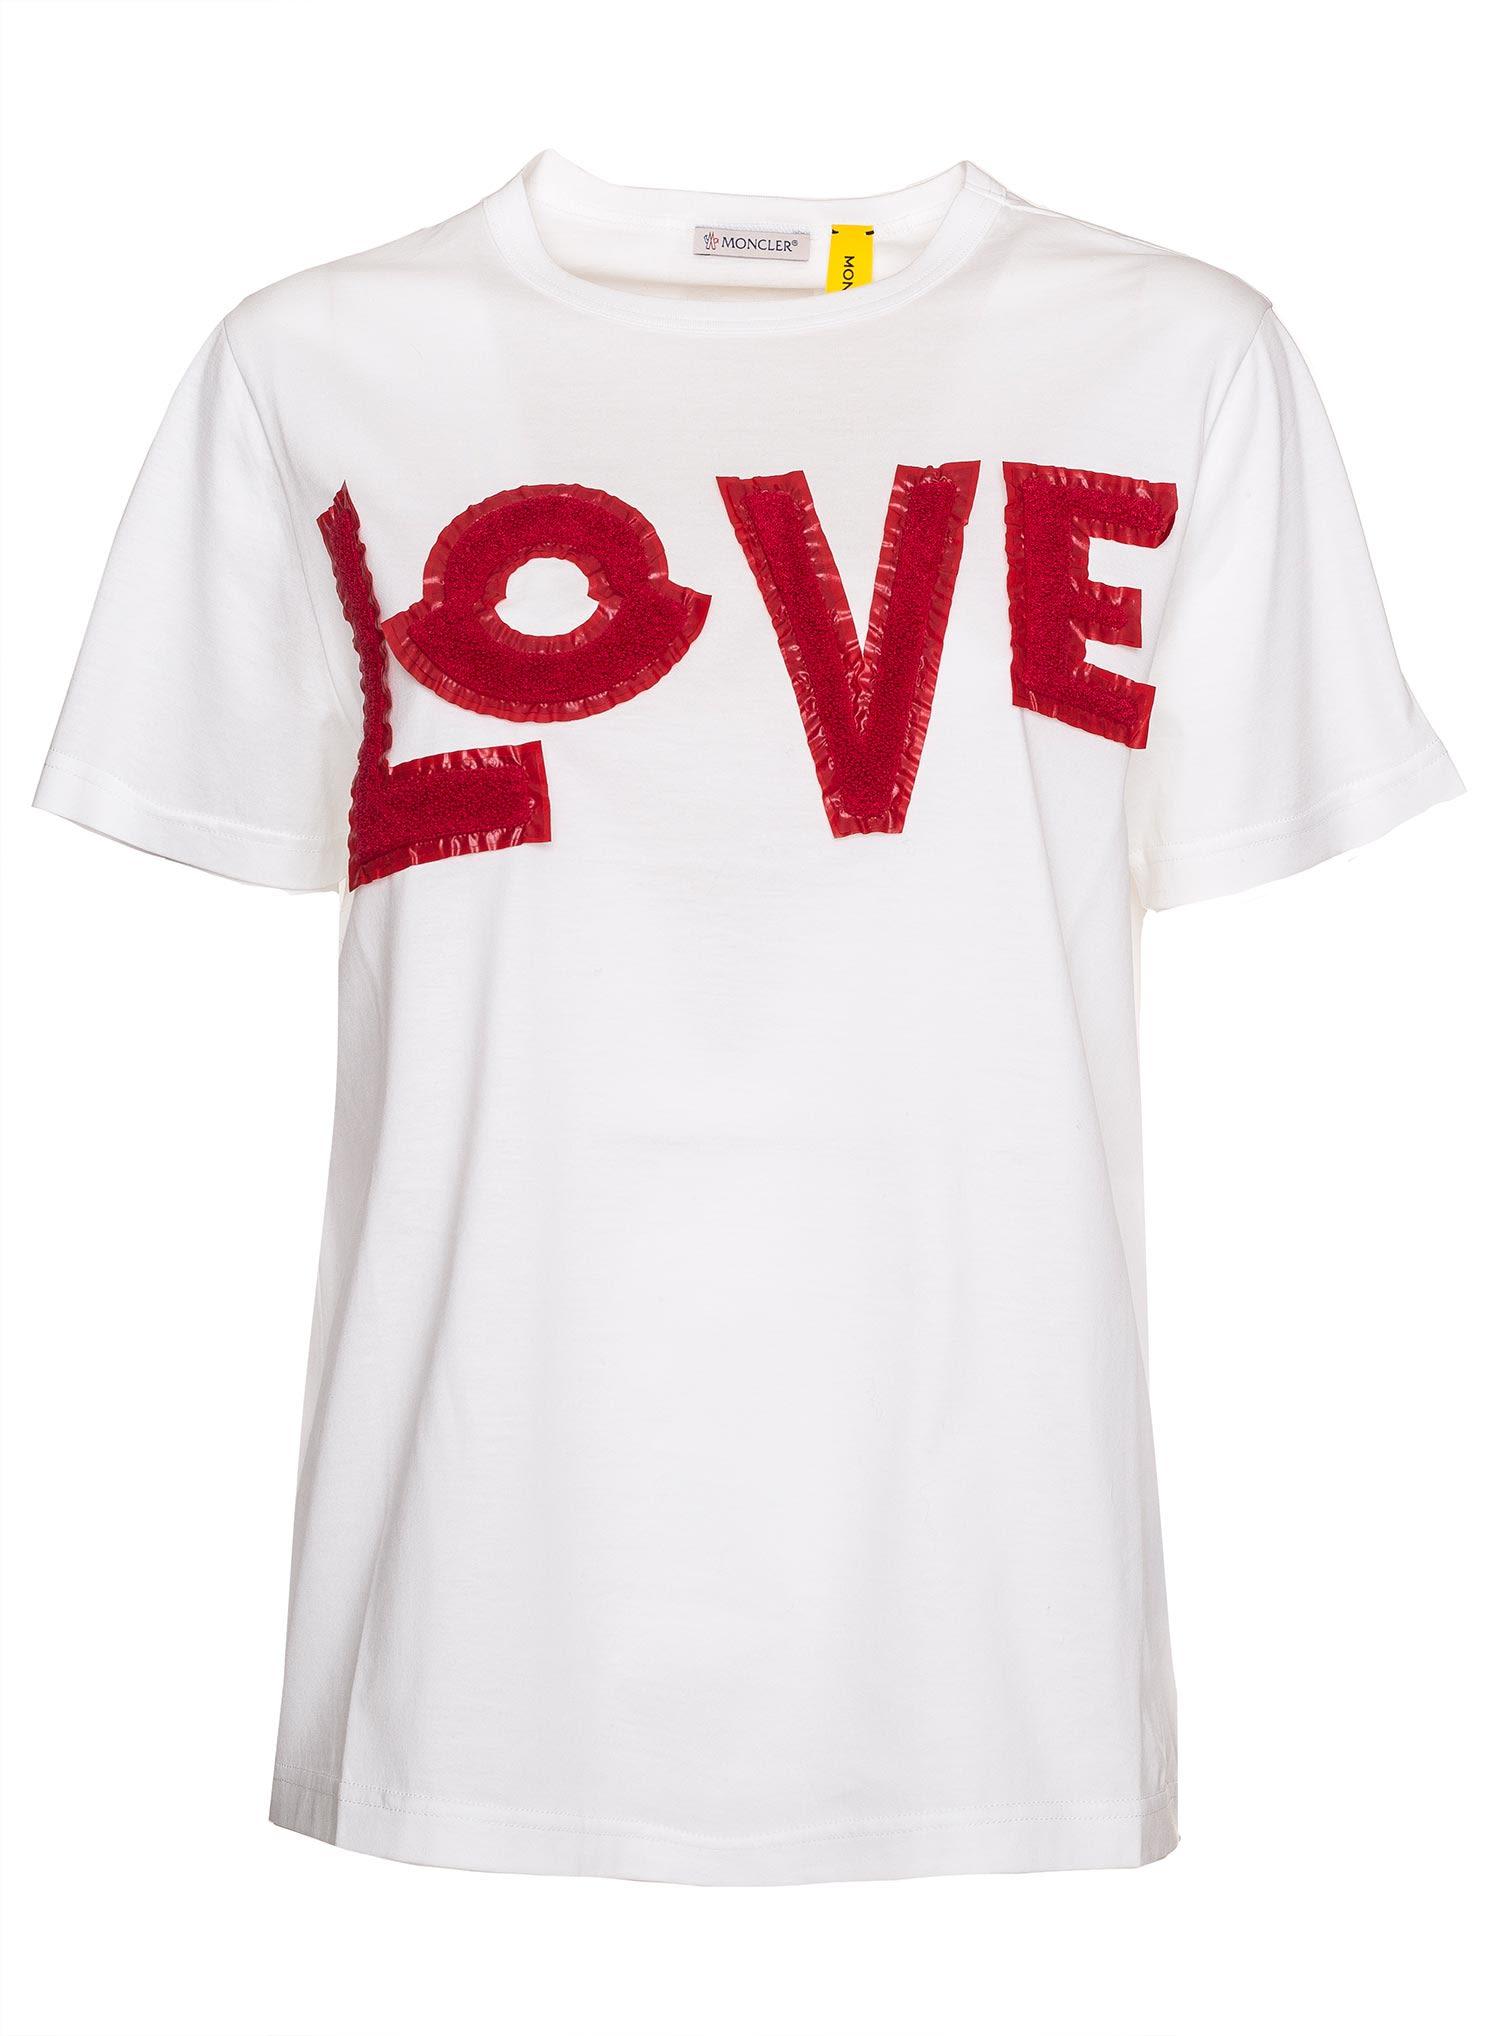 af18f6fd Moncler Genius 2 Moncler 1952 T-shirt In White - BIANCO - 10854646 ...